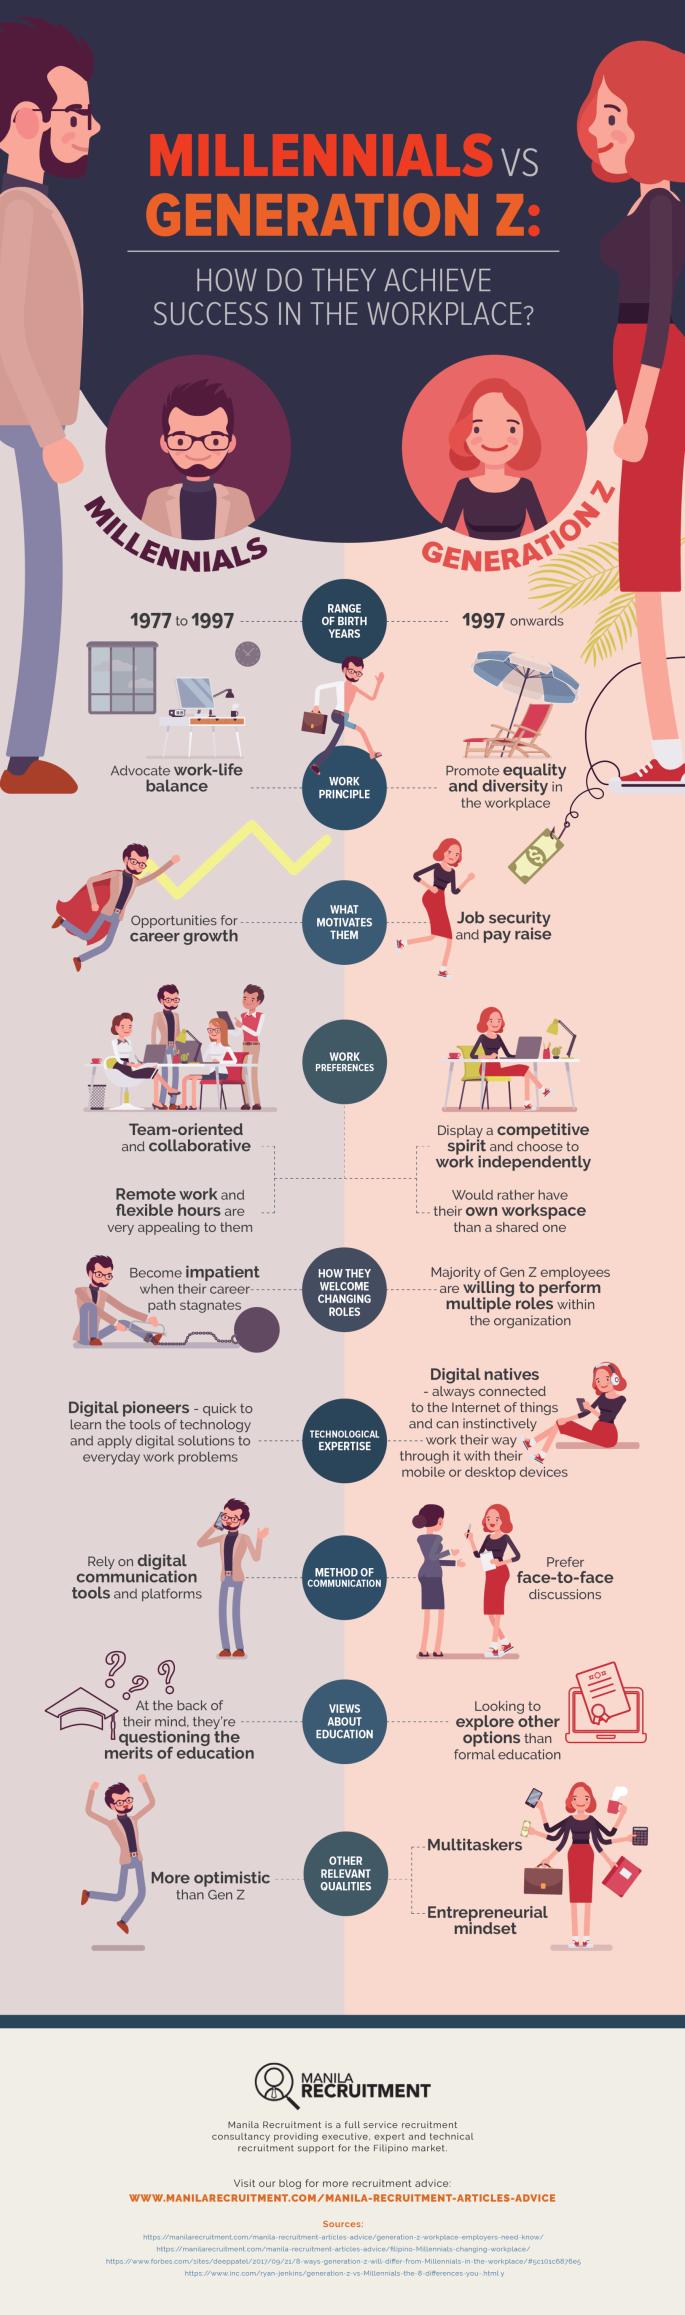 INFOGRAPHIC_Millennials-Generation-Z-success-Workplace-employment